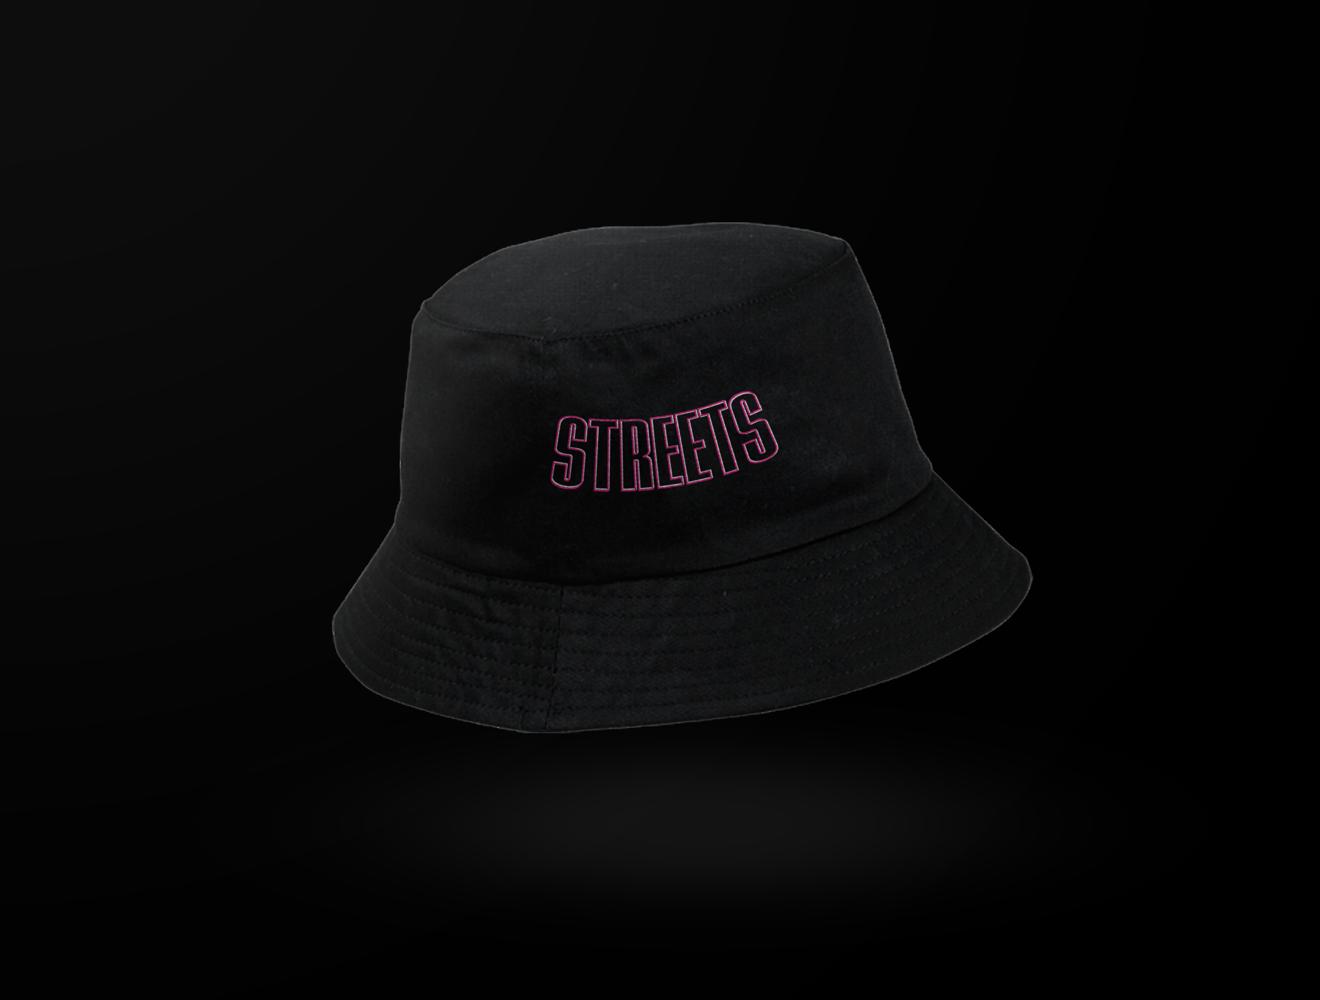 Streets Bucket Hat